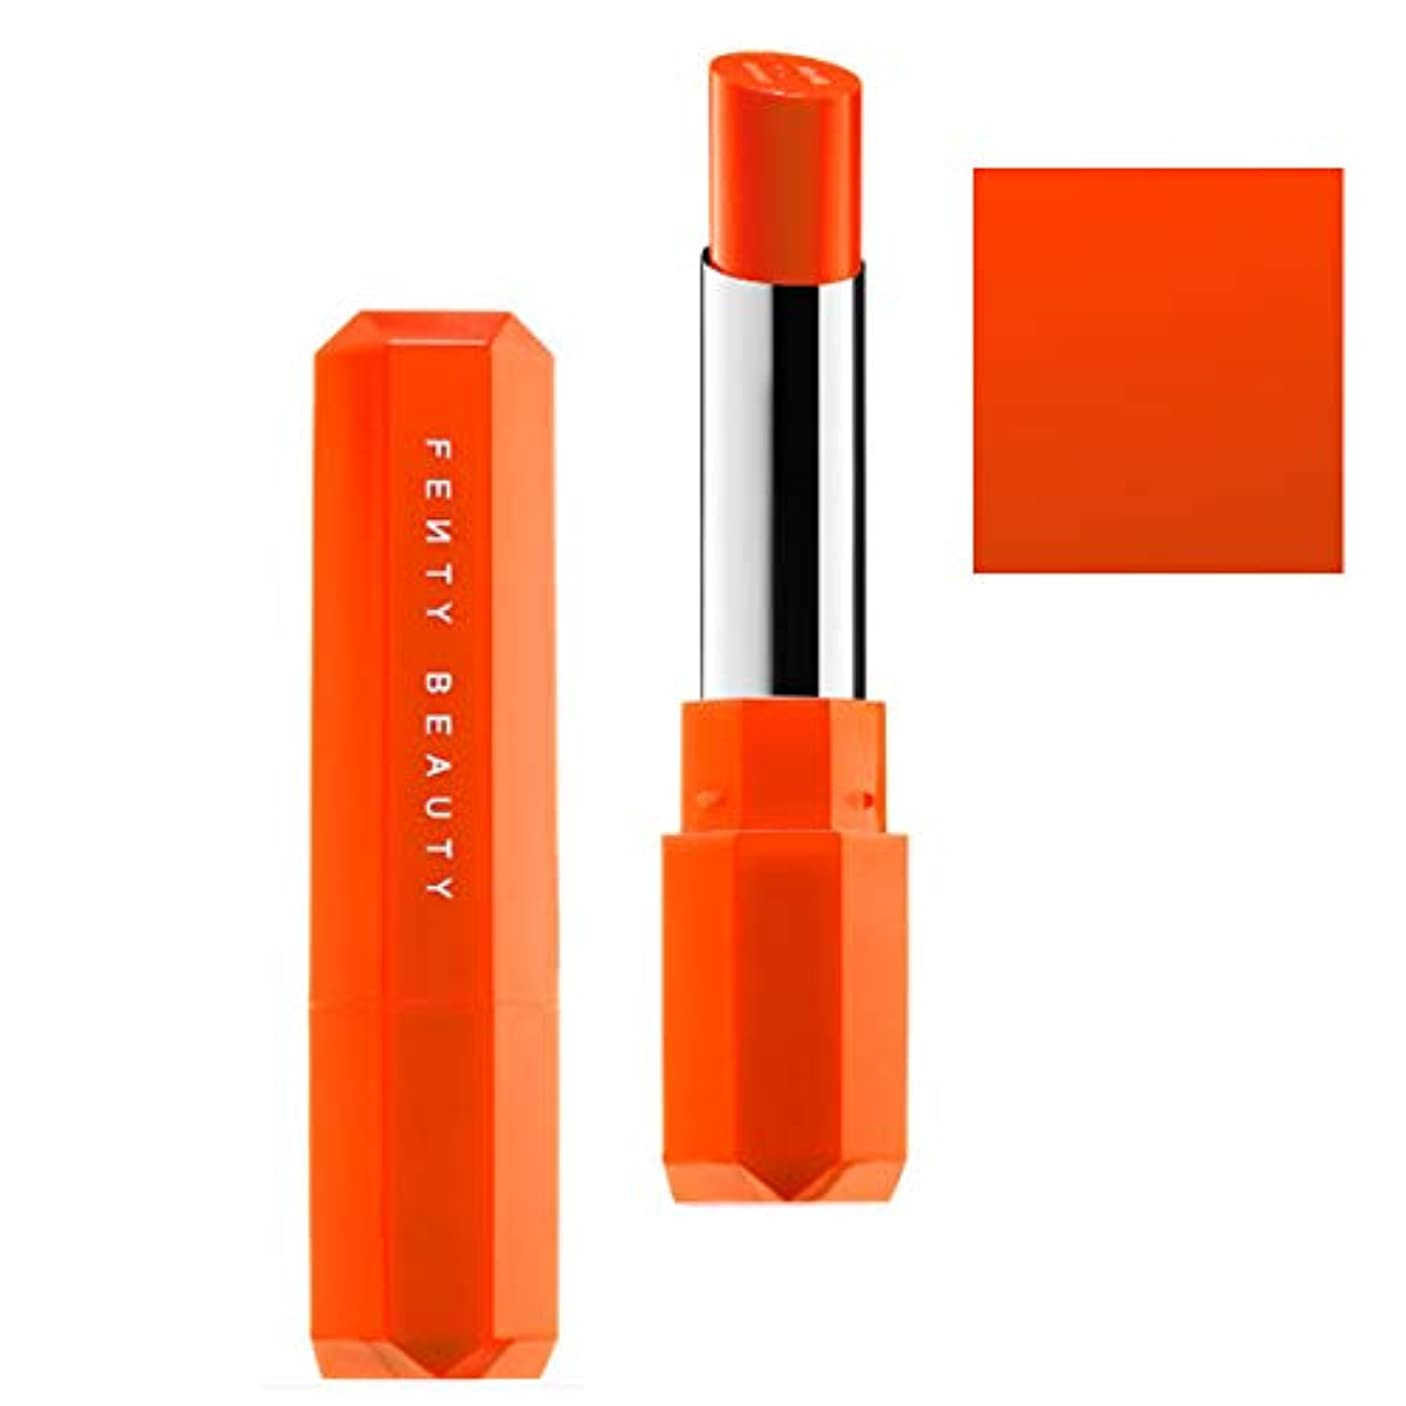 保育園郵便物バナーFENTY BEAUTY BY RIHANNA,New!!, 限定版 limited-edition, Poutsicle Juicy Satin Lipstick - Sun Snatched [海外直送品] [並行輸入品]